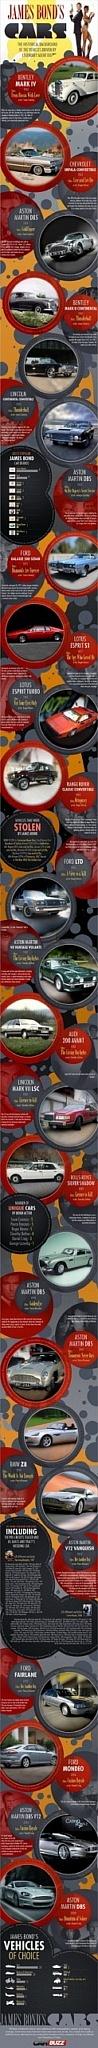 infographic james bond cars